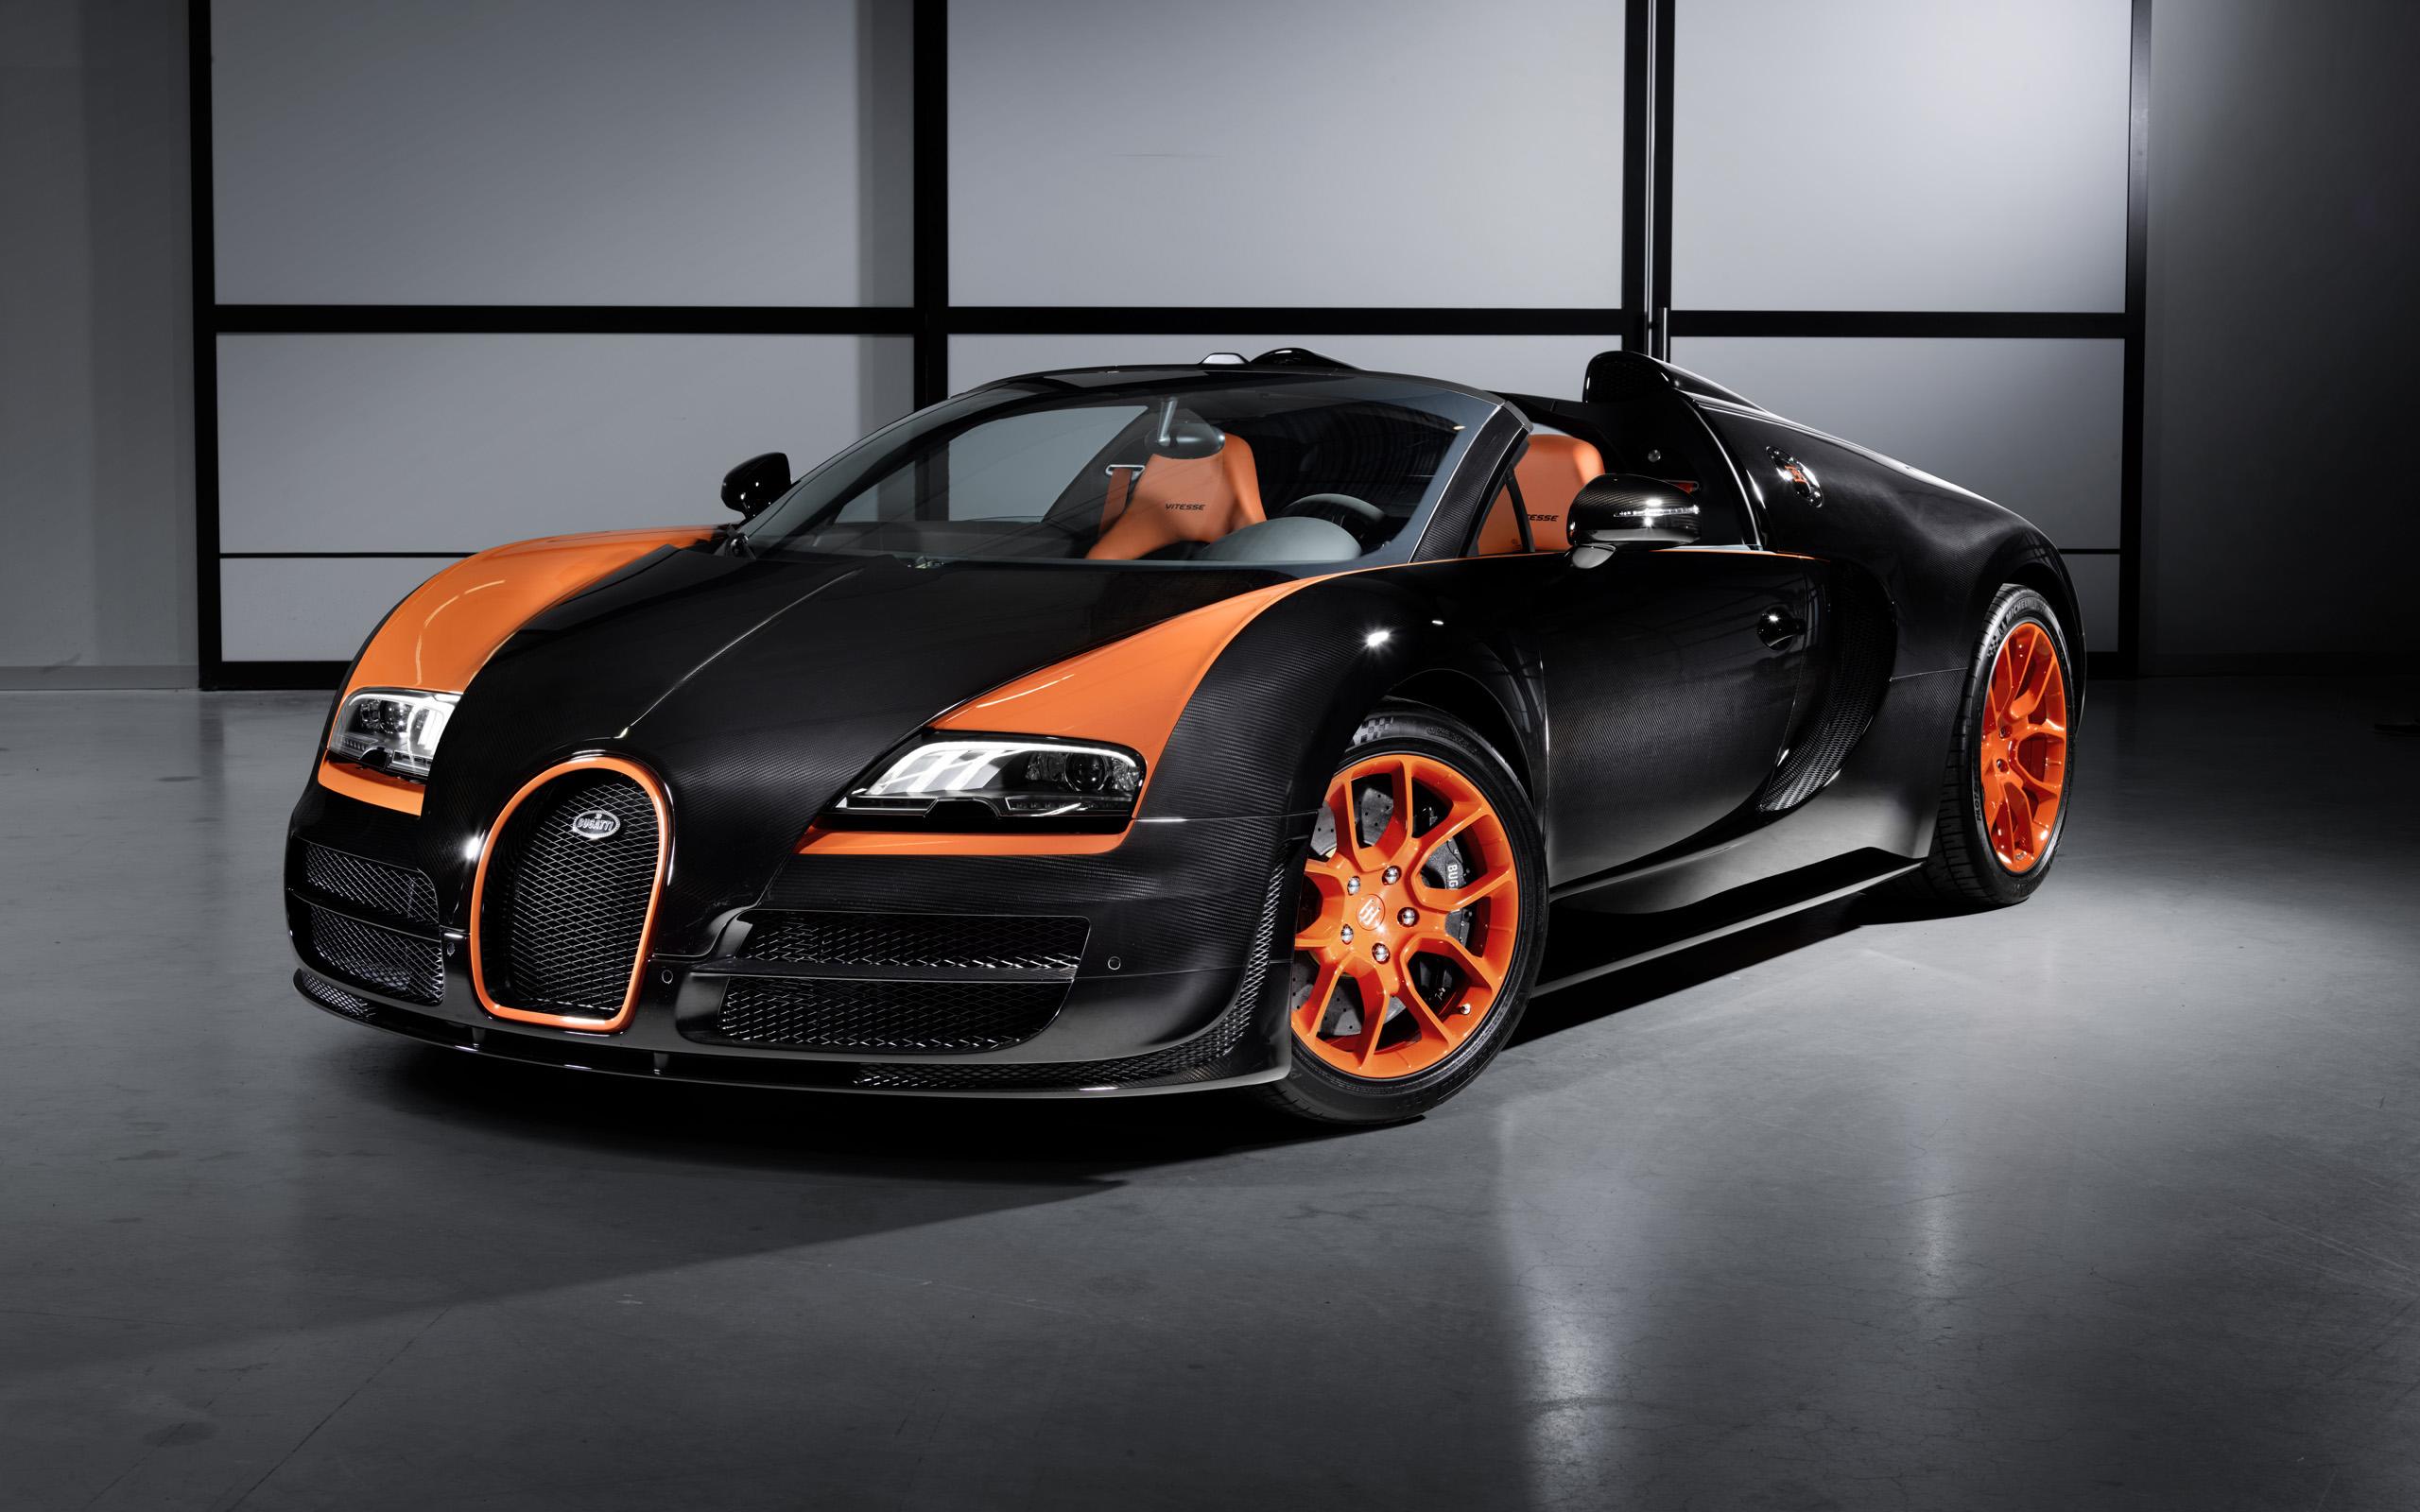 Bugatti veyron wallpaper download impremedia bugatti veyron wallpapers high quality download voltagebd Choice Image